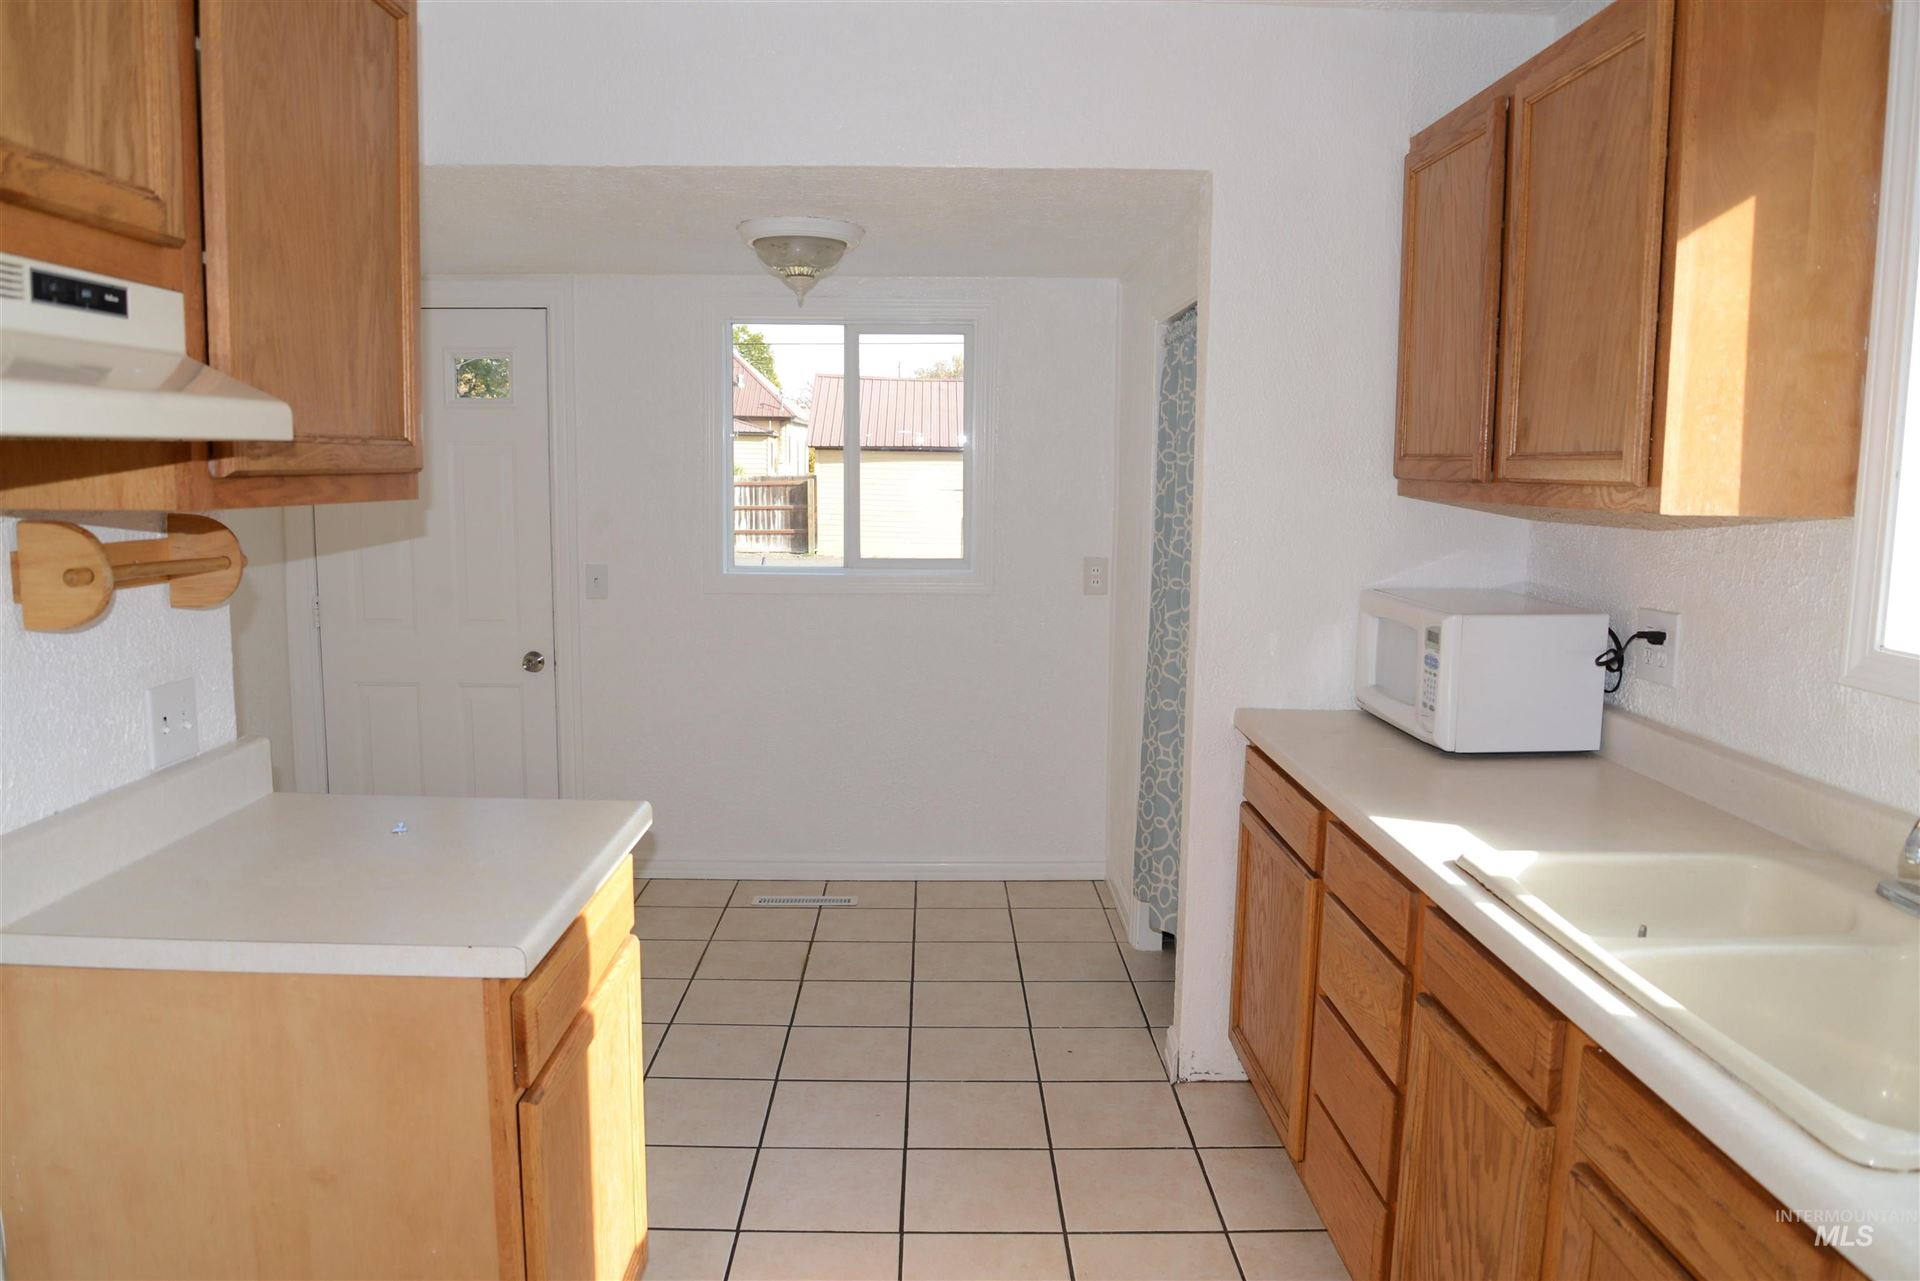 Photo of 821 11th St, Clarkston, WA 99403 (MLS # 98817037)